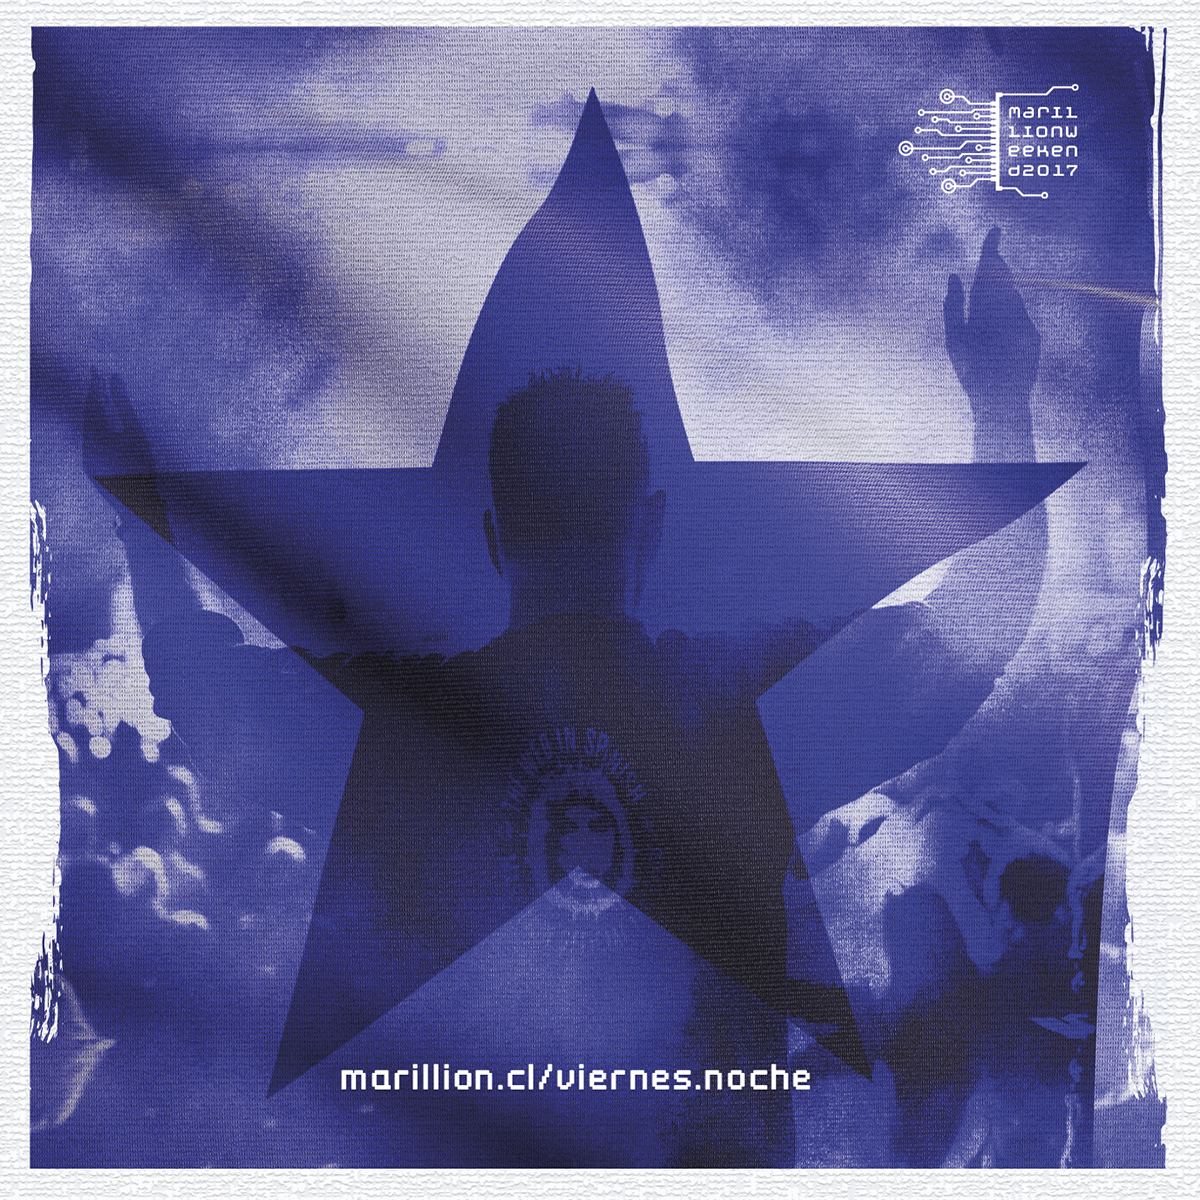 MARILLION.CL/VIERNES.NOCHE LIVE ALBUM